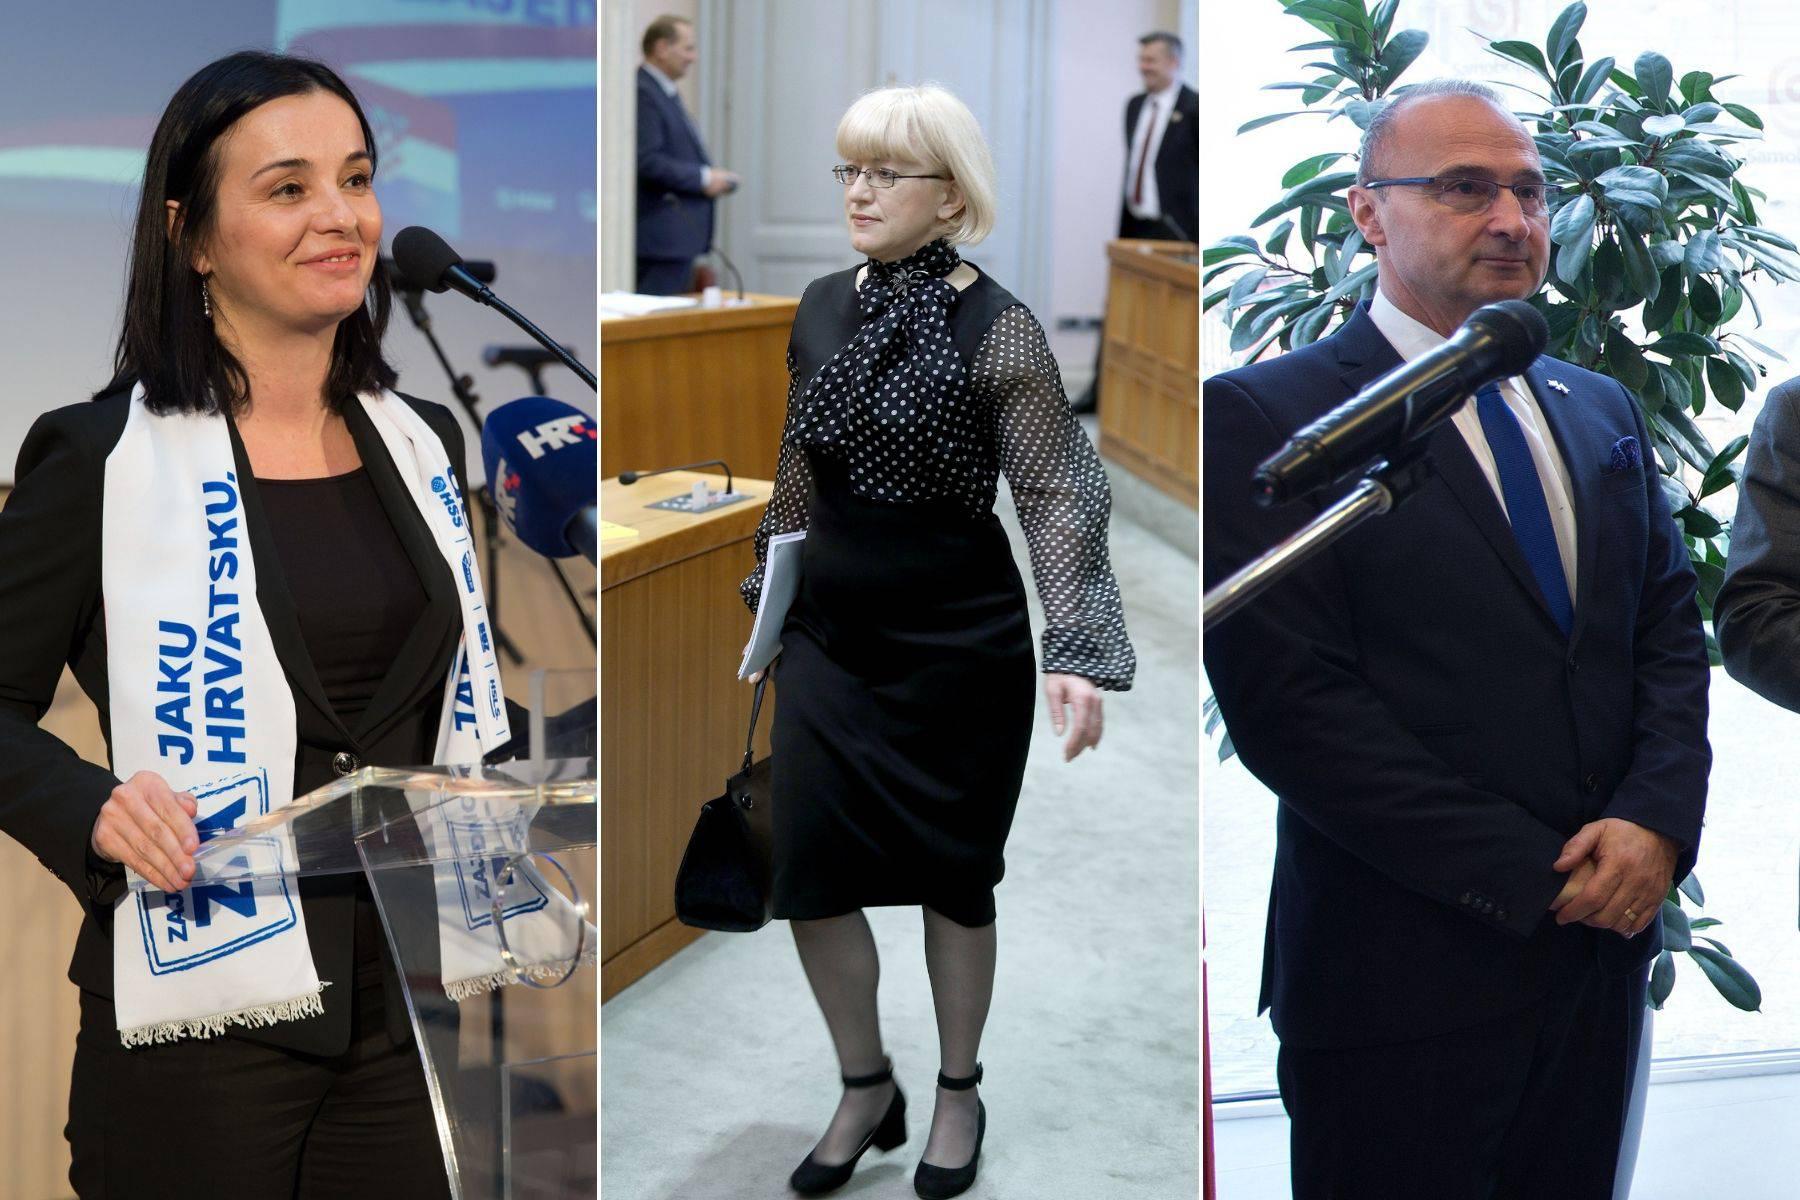 Bedeković je pedagogica, Grlić veleposlanik, a Vučković pjeva